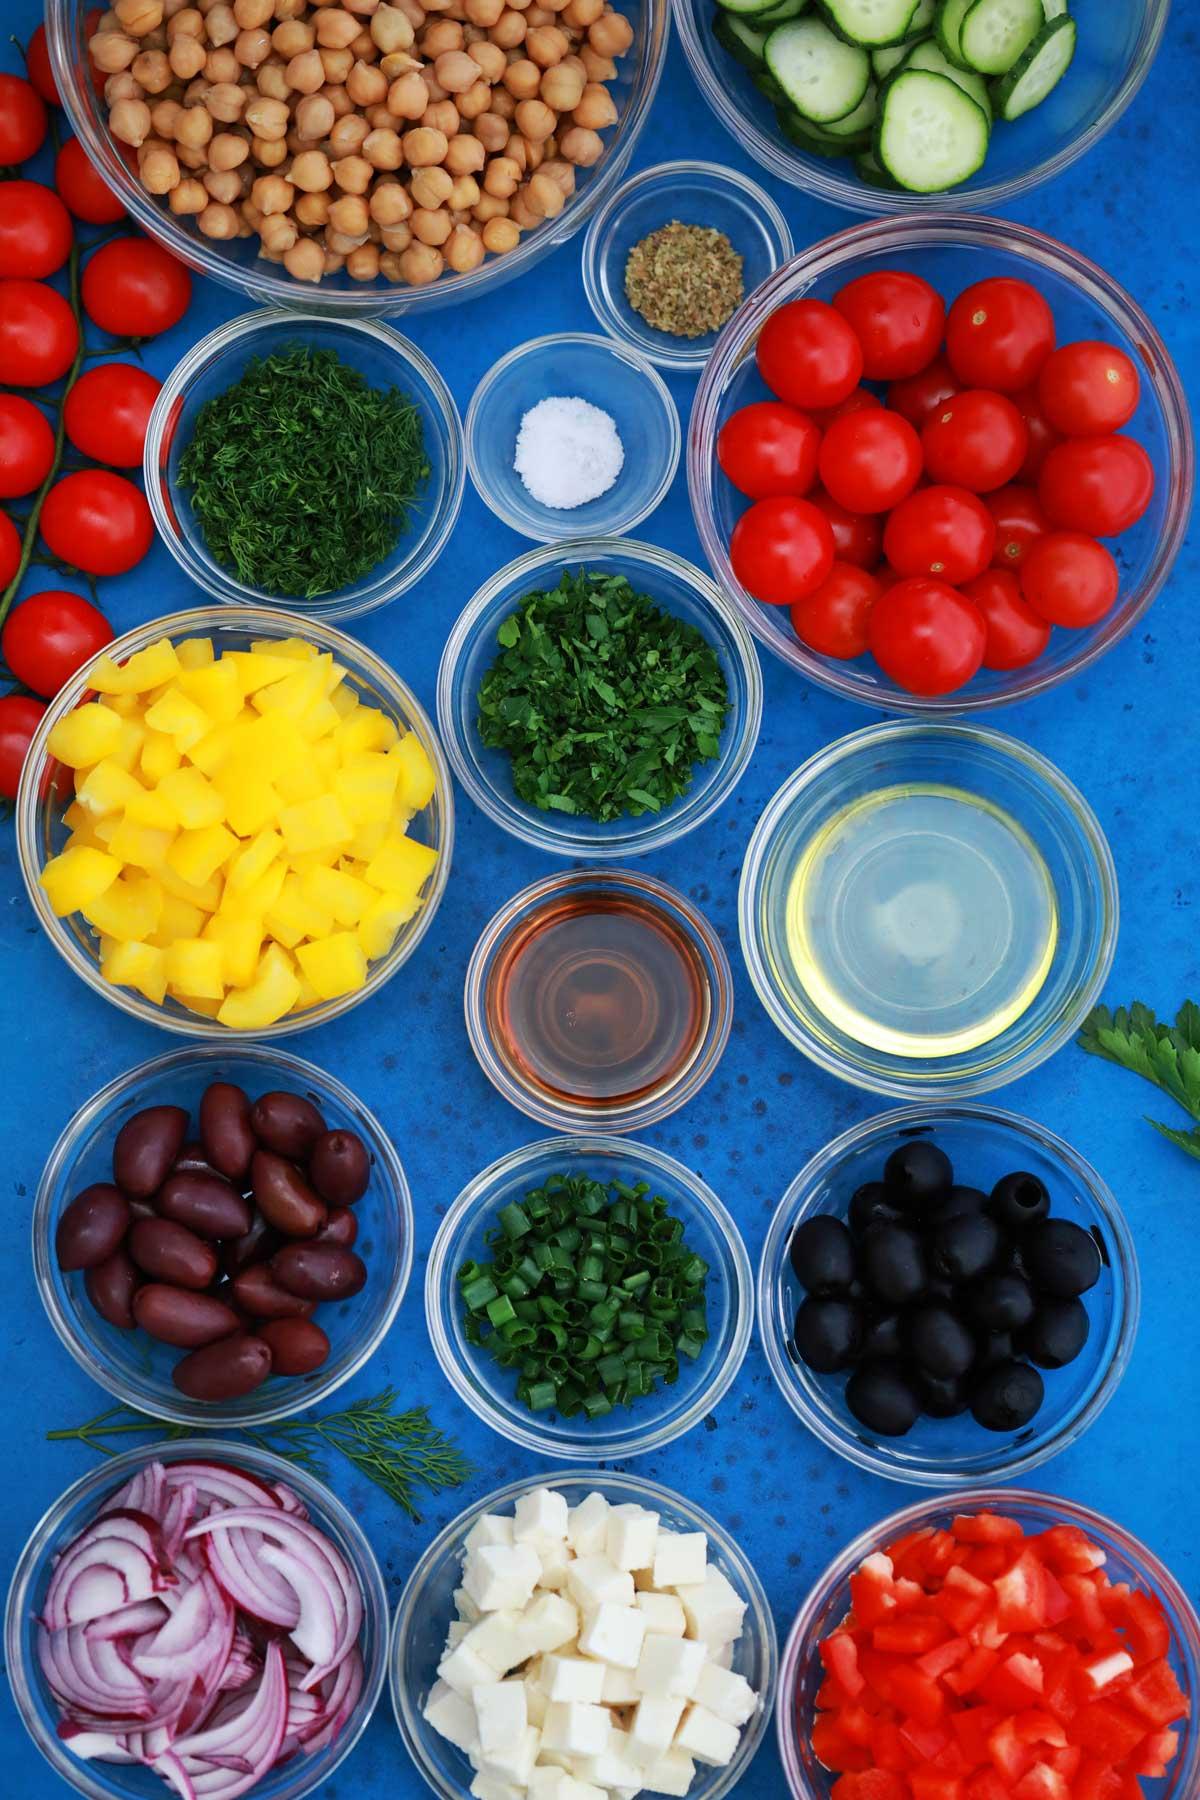 Ingredients for Greek chickpea salad